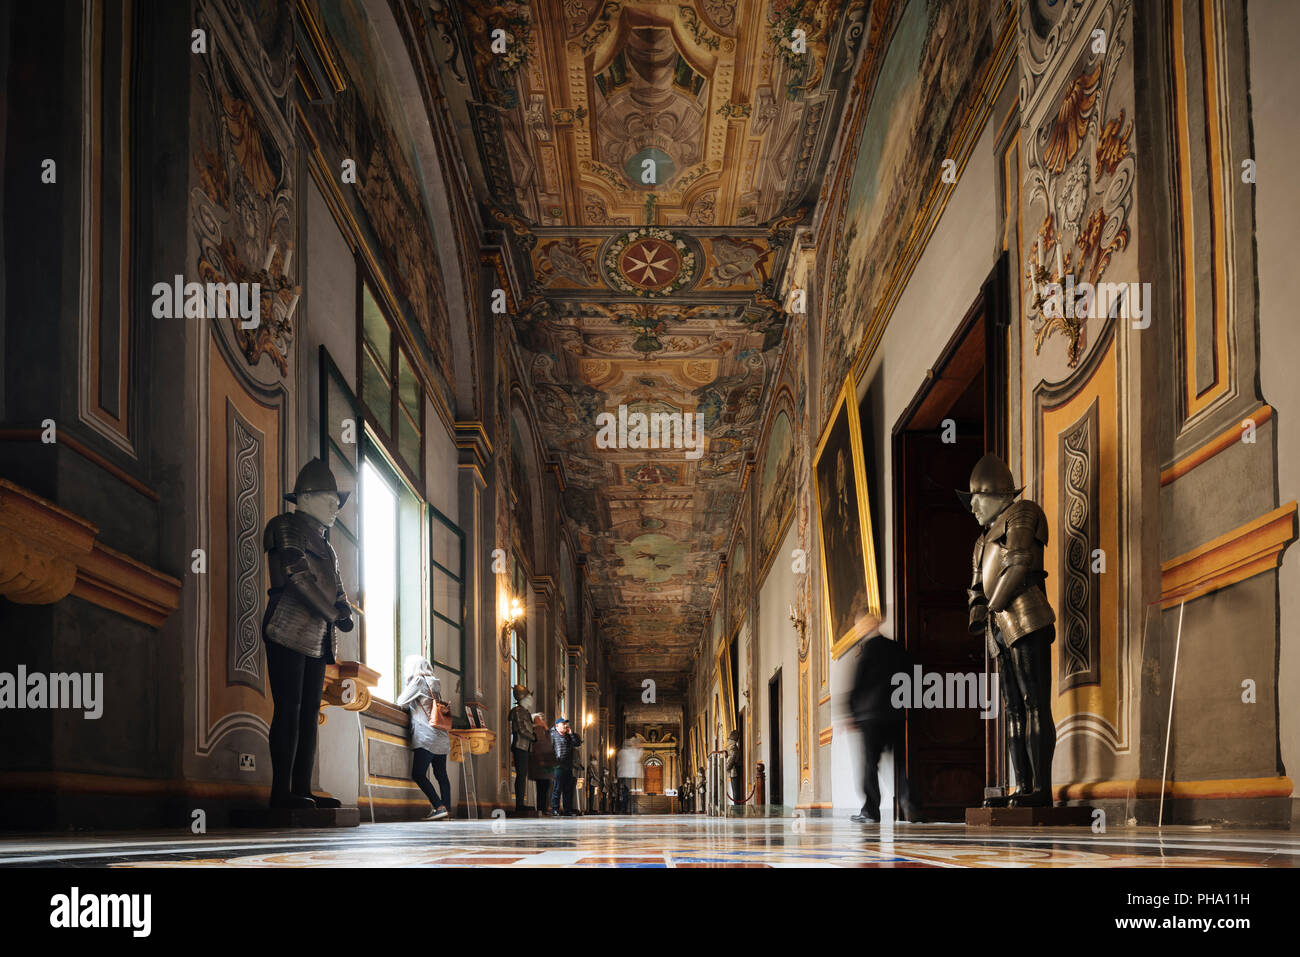 Interior of Grandmaster's Palace State Apartments, Valletta, Malta, Europe - Stock Image